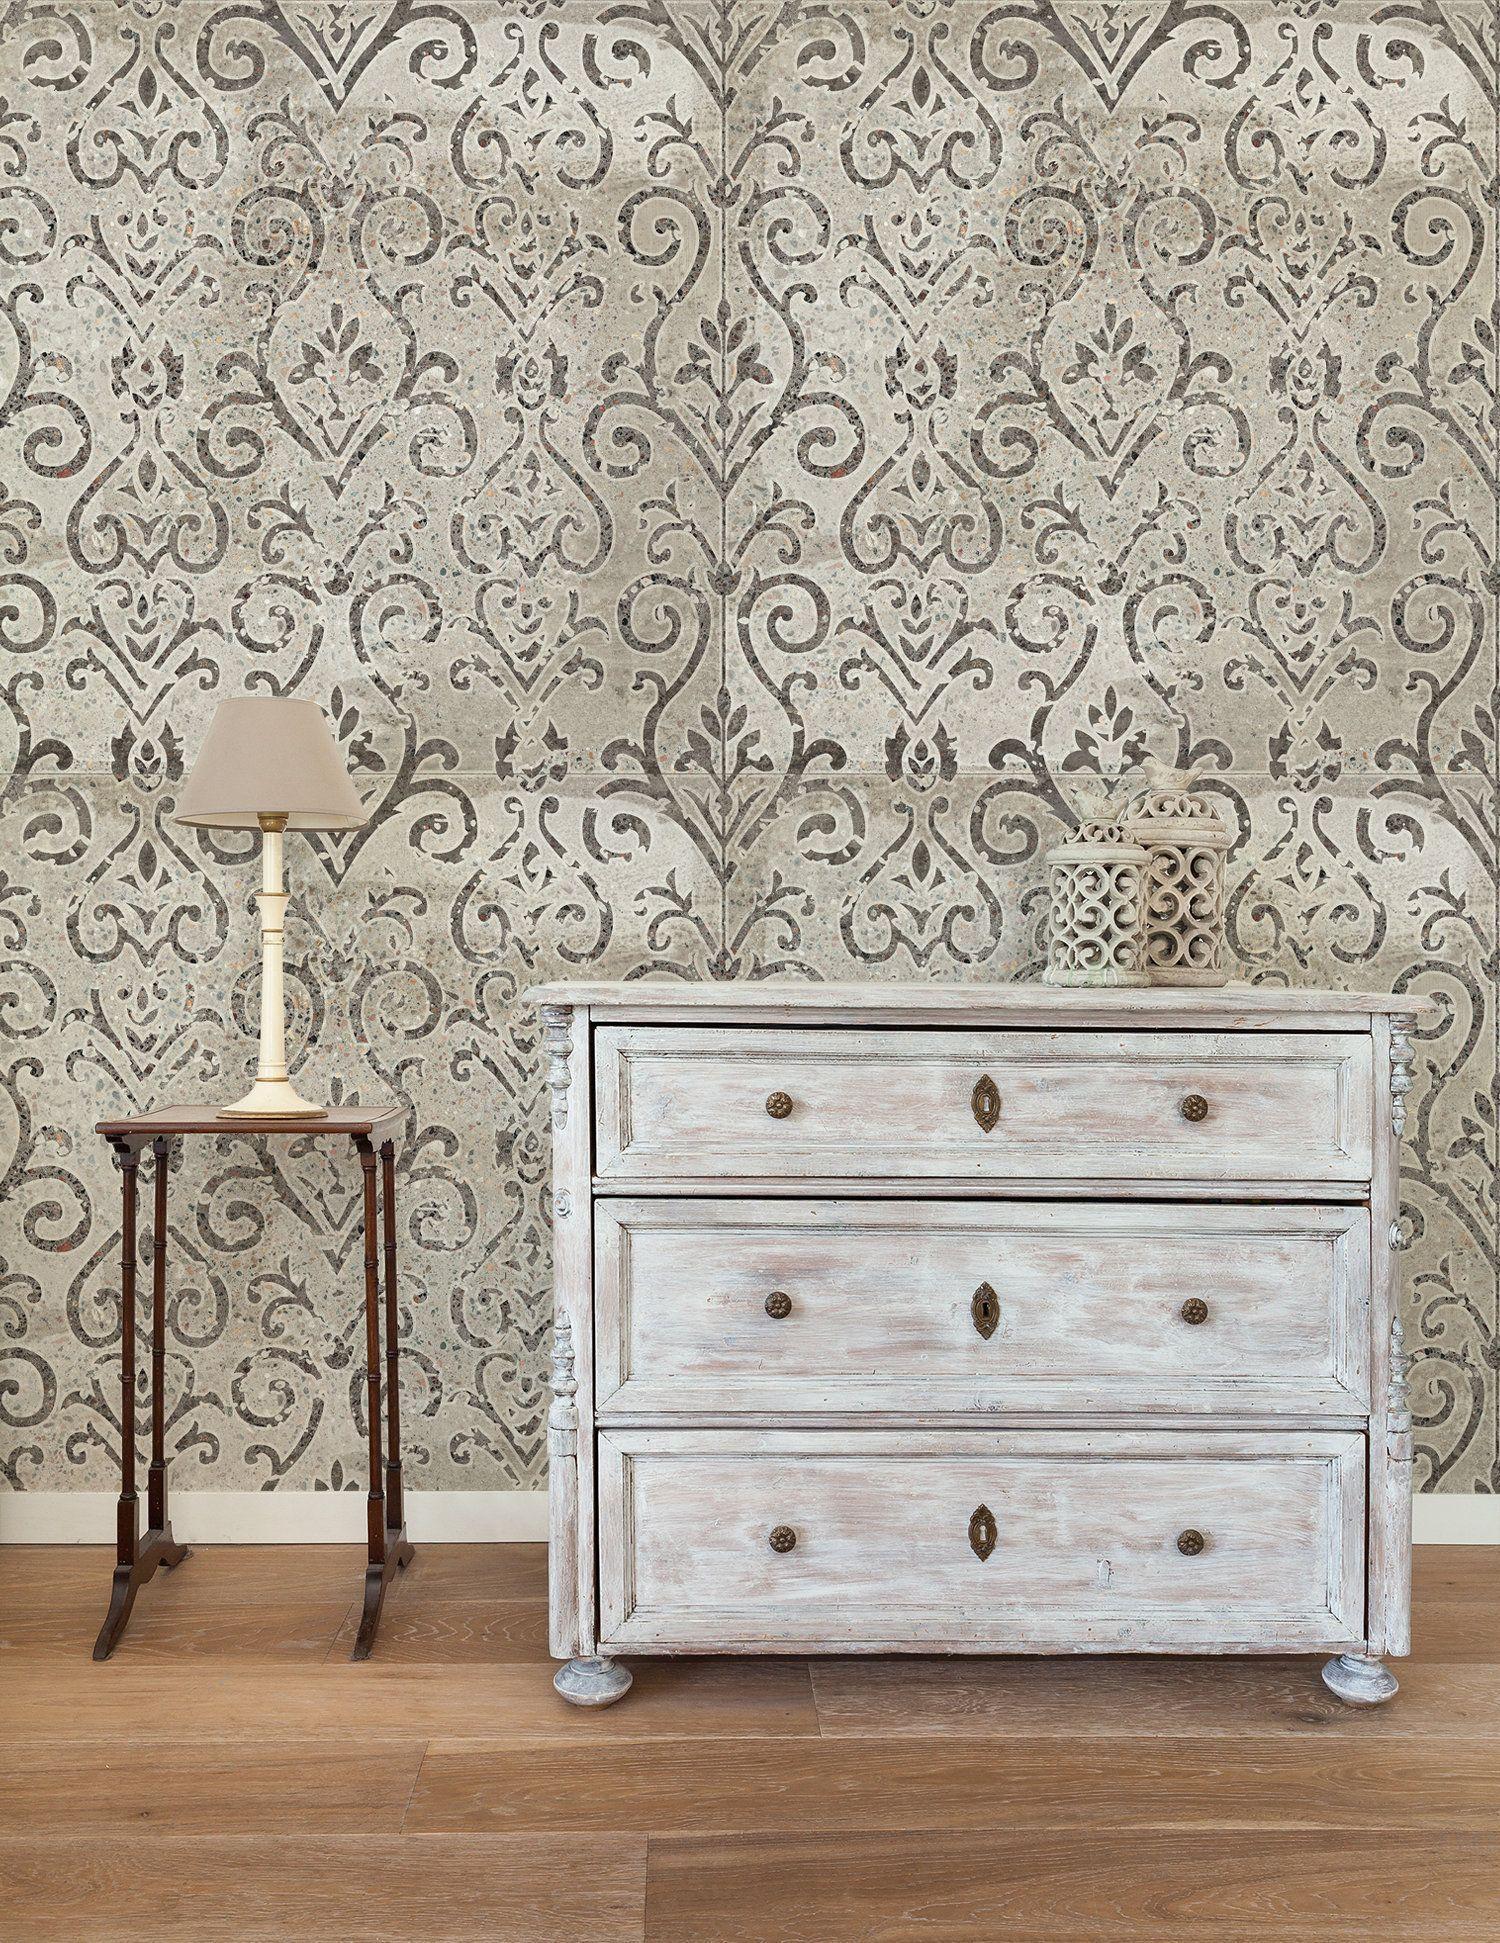 Pin On Vintage Art Wallpapers Retro Wallpaper Stone Texture Stone Tiles